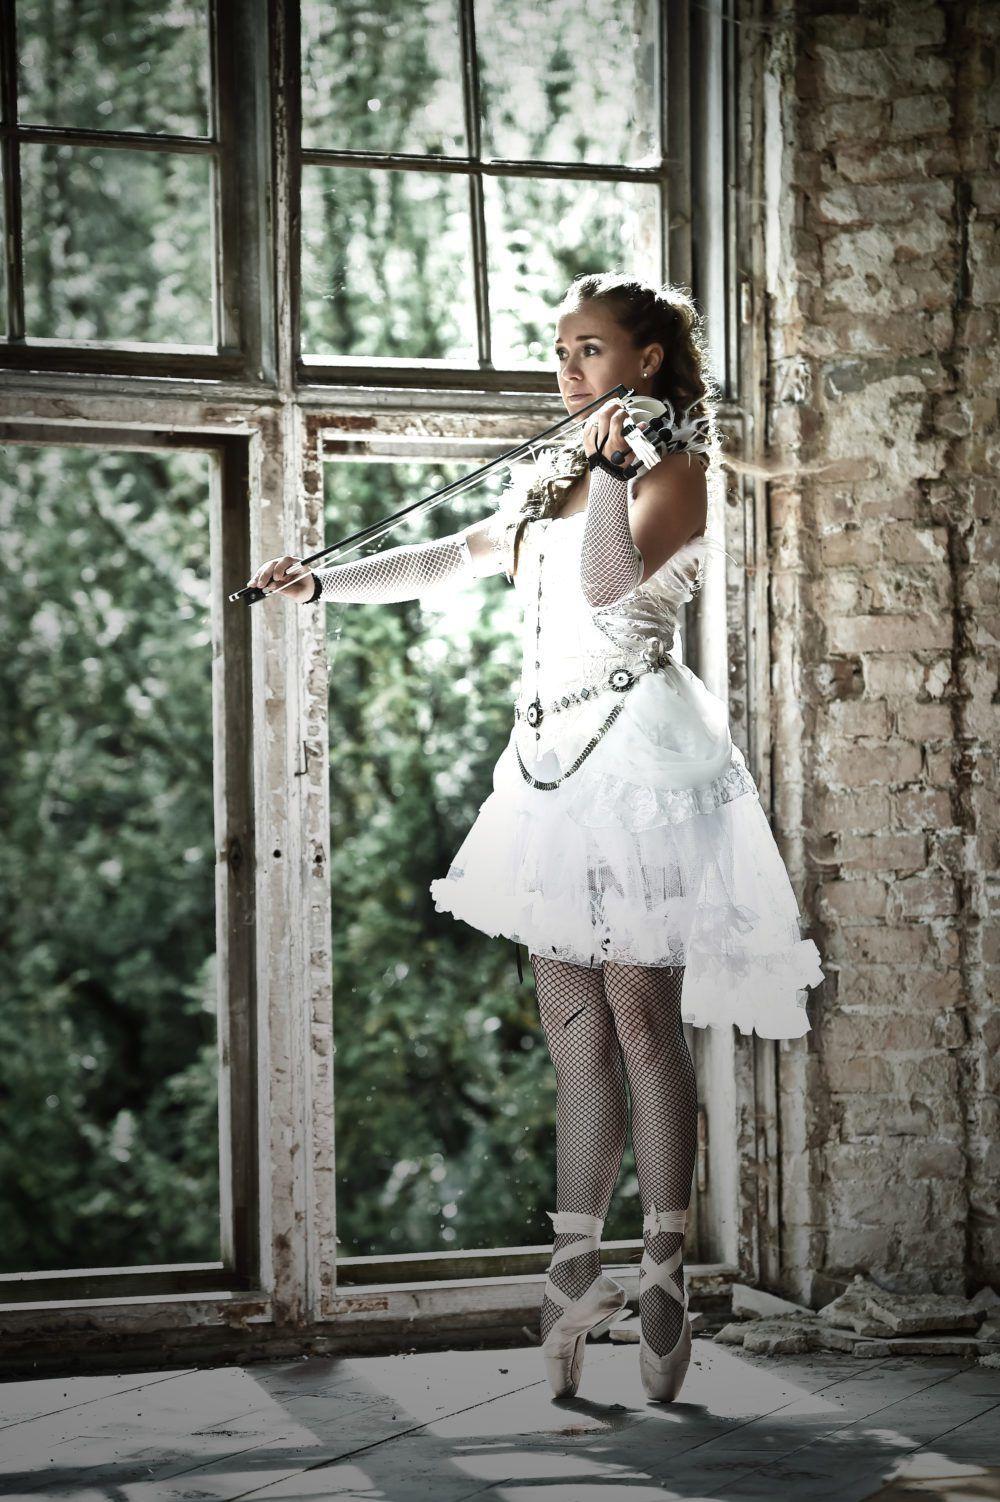 Berliner Violinistin Nora Kudrjawizki